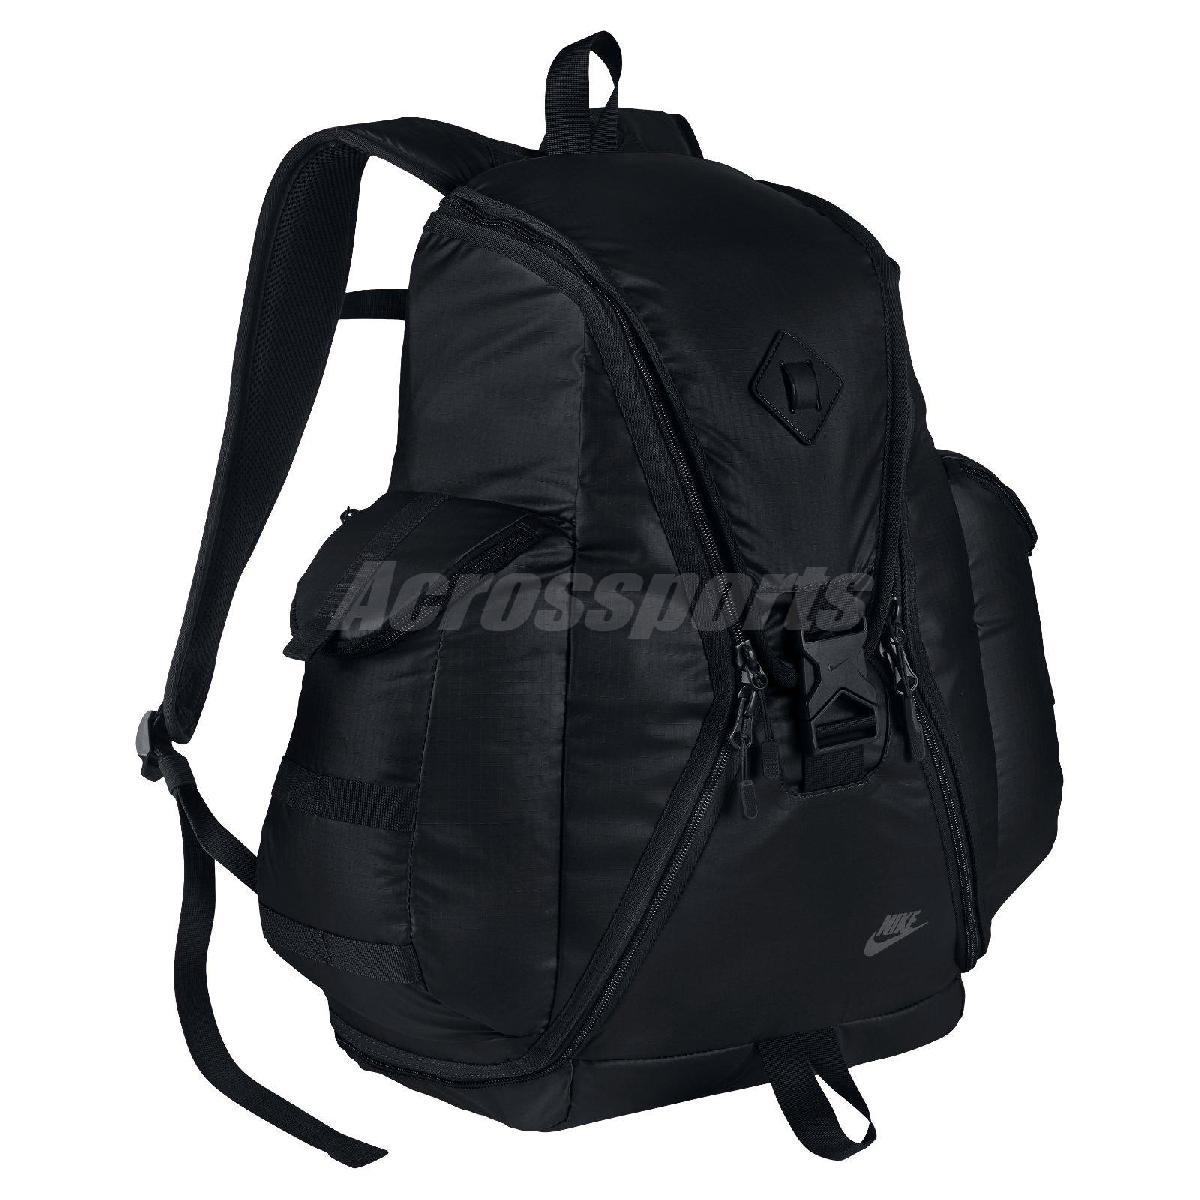 Nike後背包Cheyenne Responder黑全黑色NSW男舒適好背包包NQZS PUMP306 BA5236-010